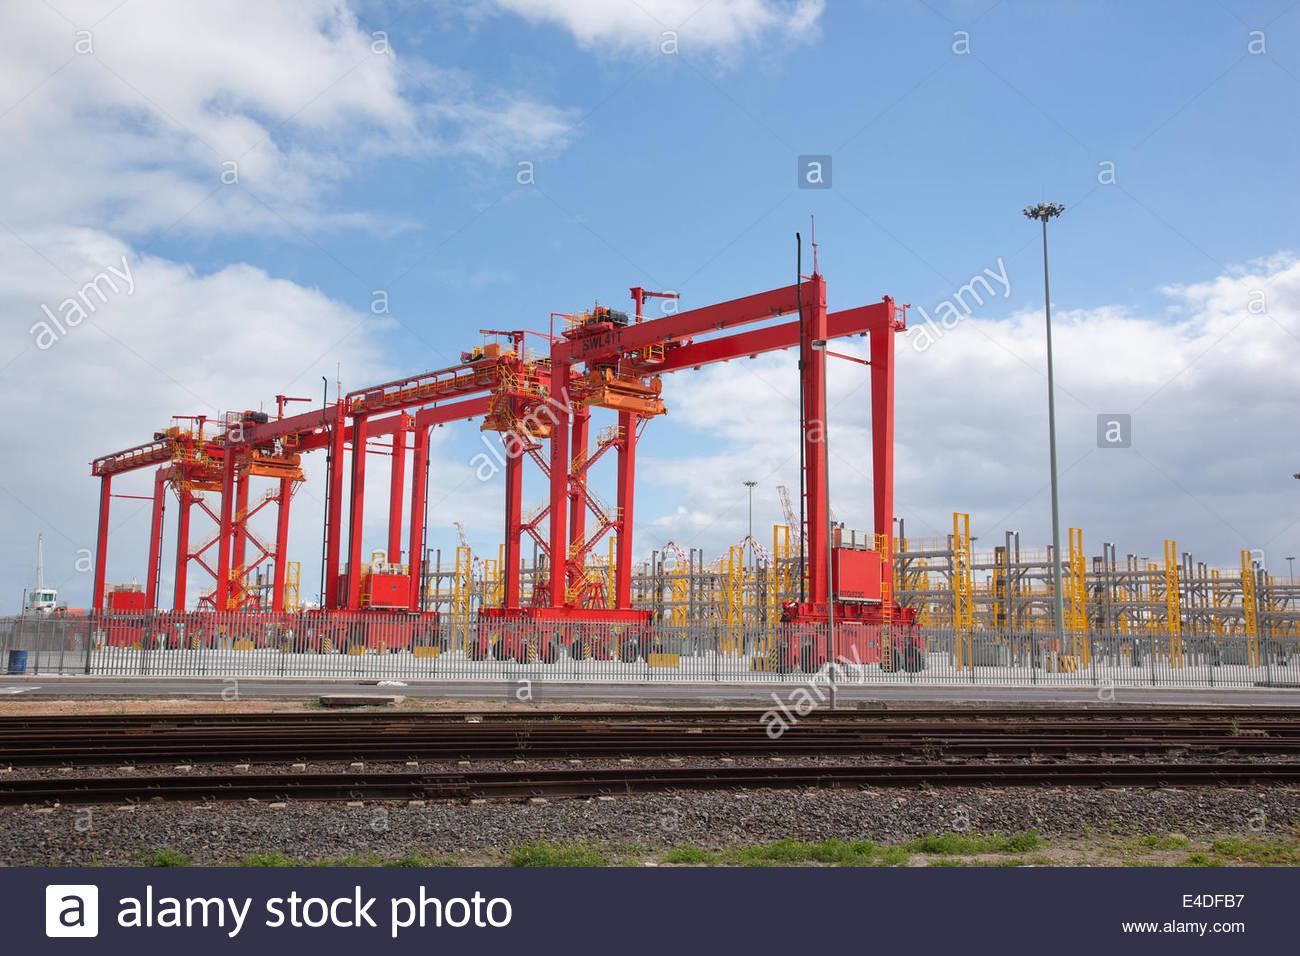 Cargo crane in dockyard - Stock Image